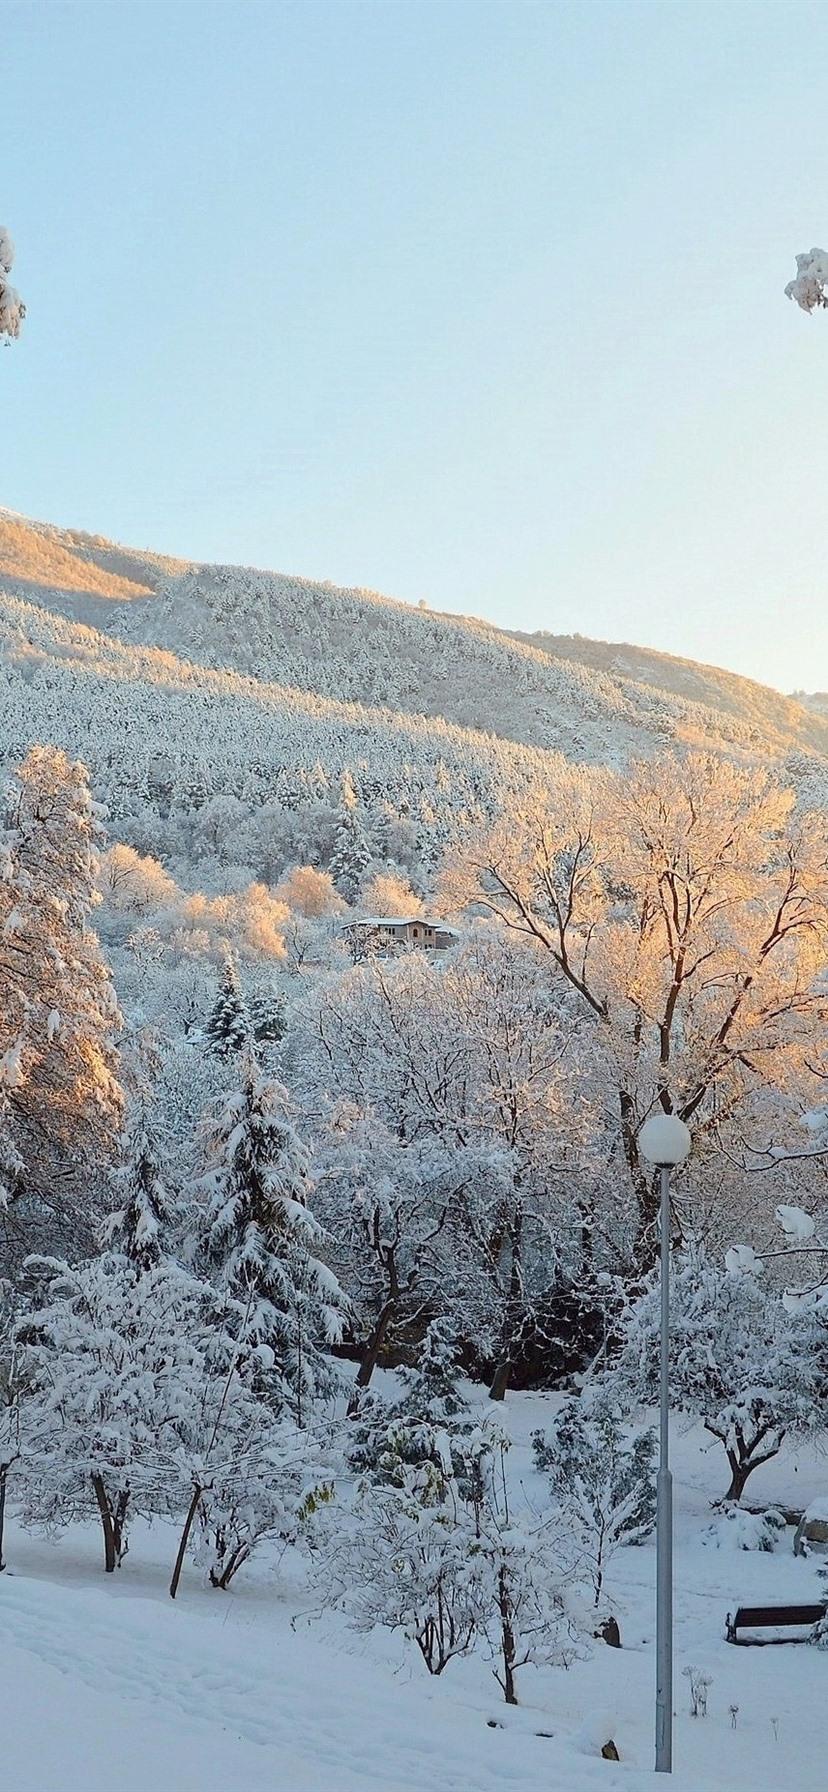 Winter, snow, trees, park 828x1792 iPhone XR wallpaper